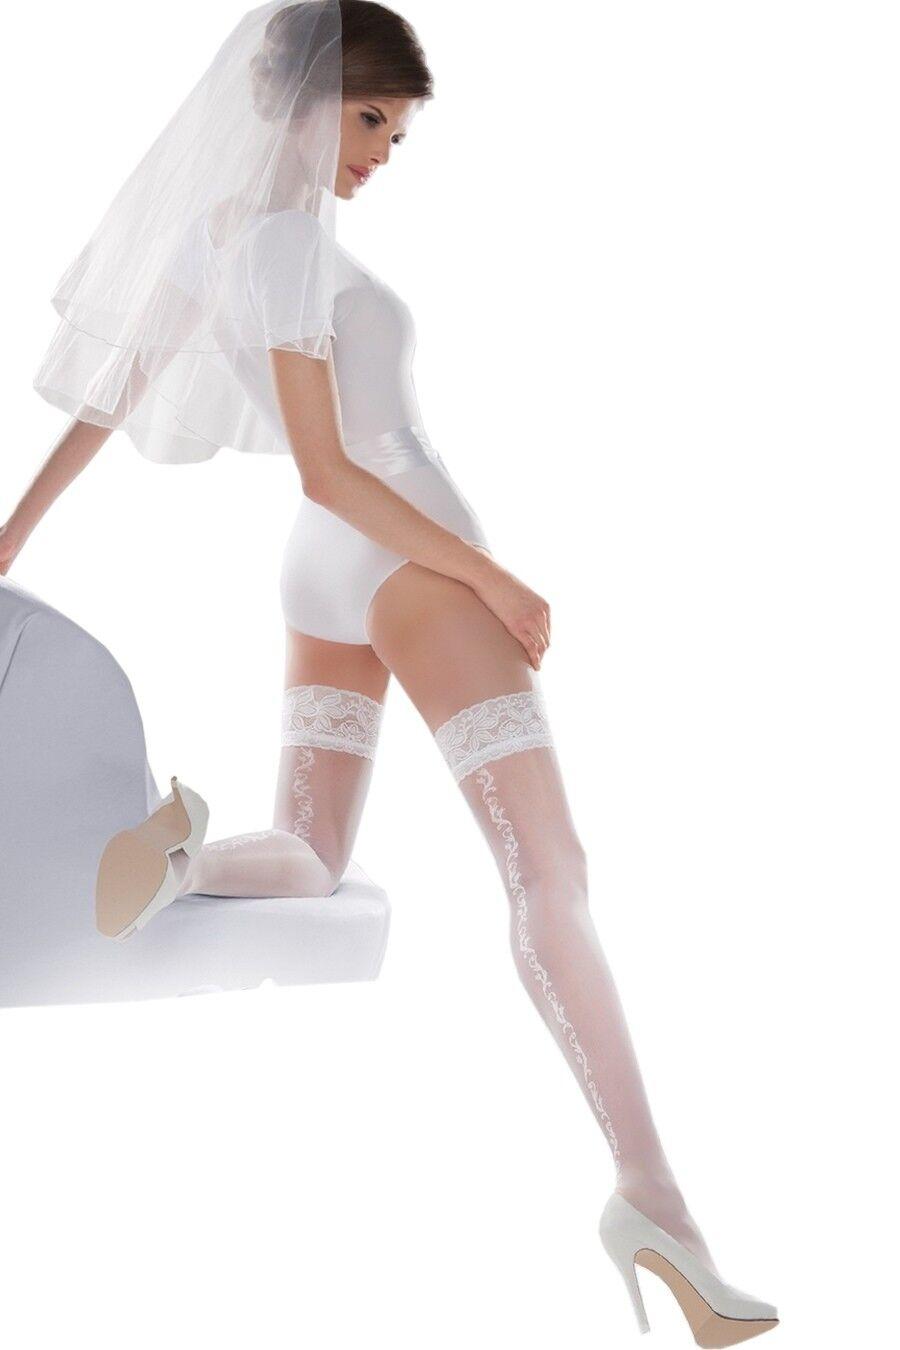 Gabriella - Bas blanc mariage autofixant jarretière dentelle 20 den ... 193c87aa937